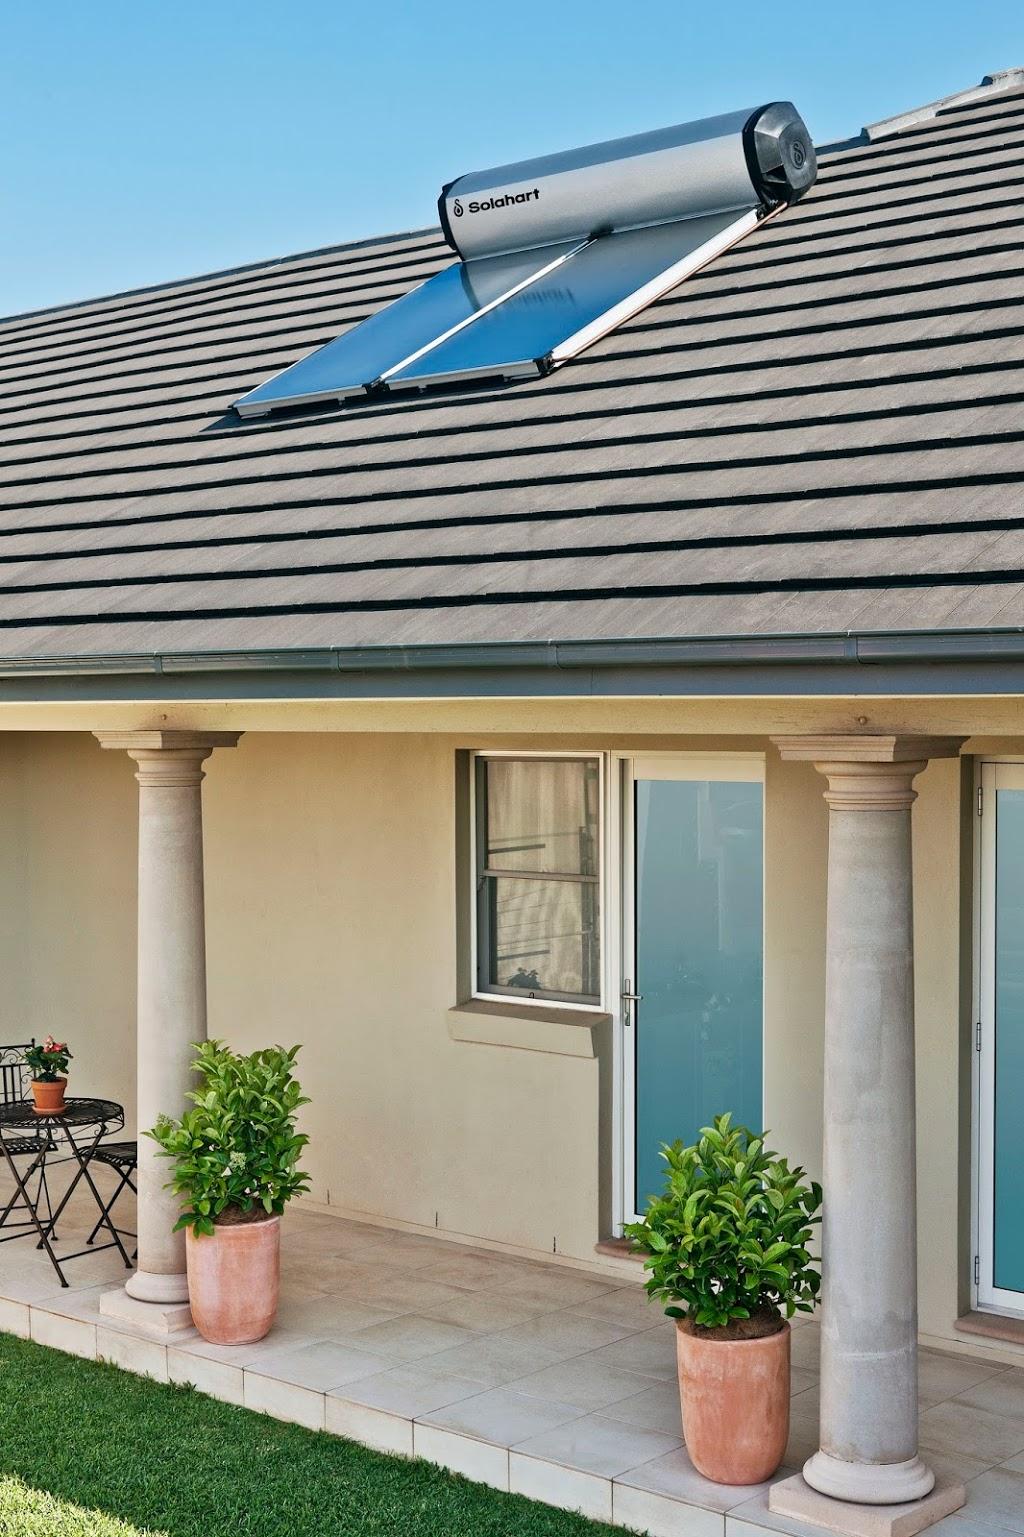 Solahart South Australian State Office | store | 35 Jonal Dr, Cavan SA 5094, Australia | 0883430055 OR +61 8 8343 0055